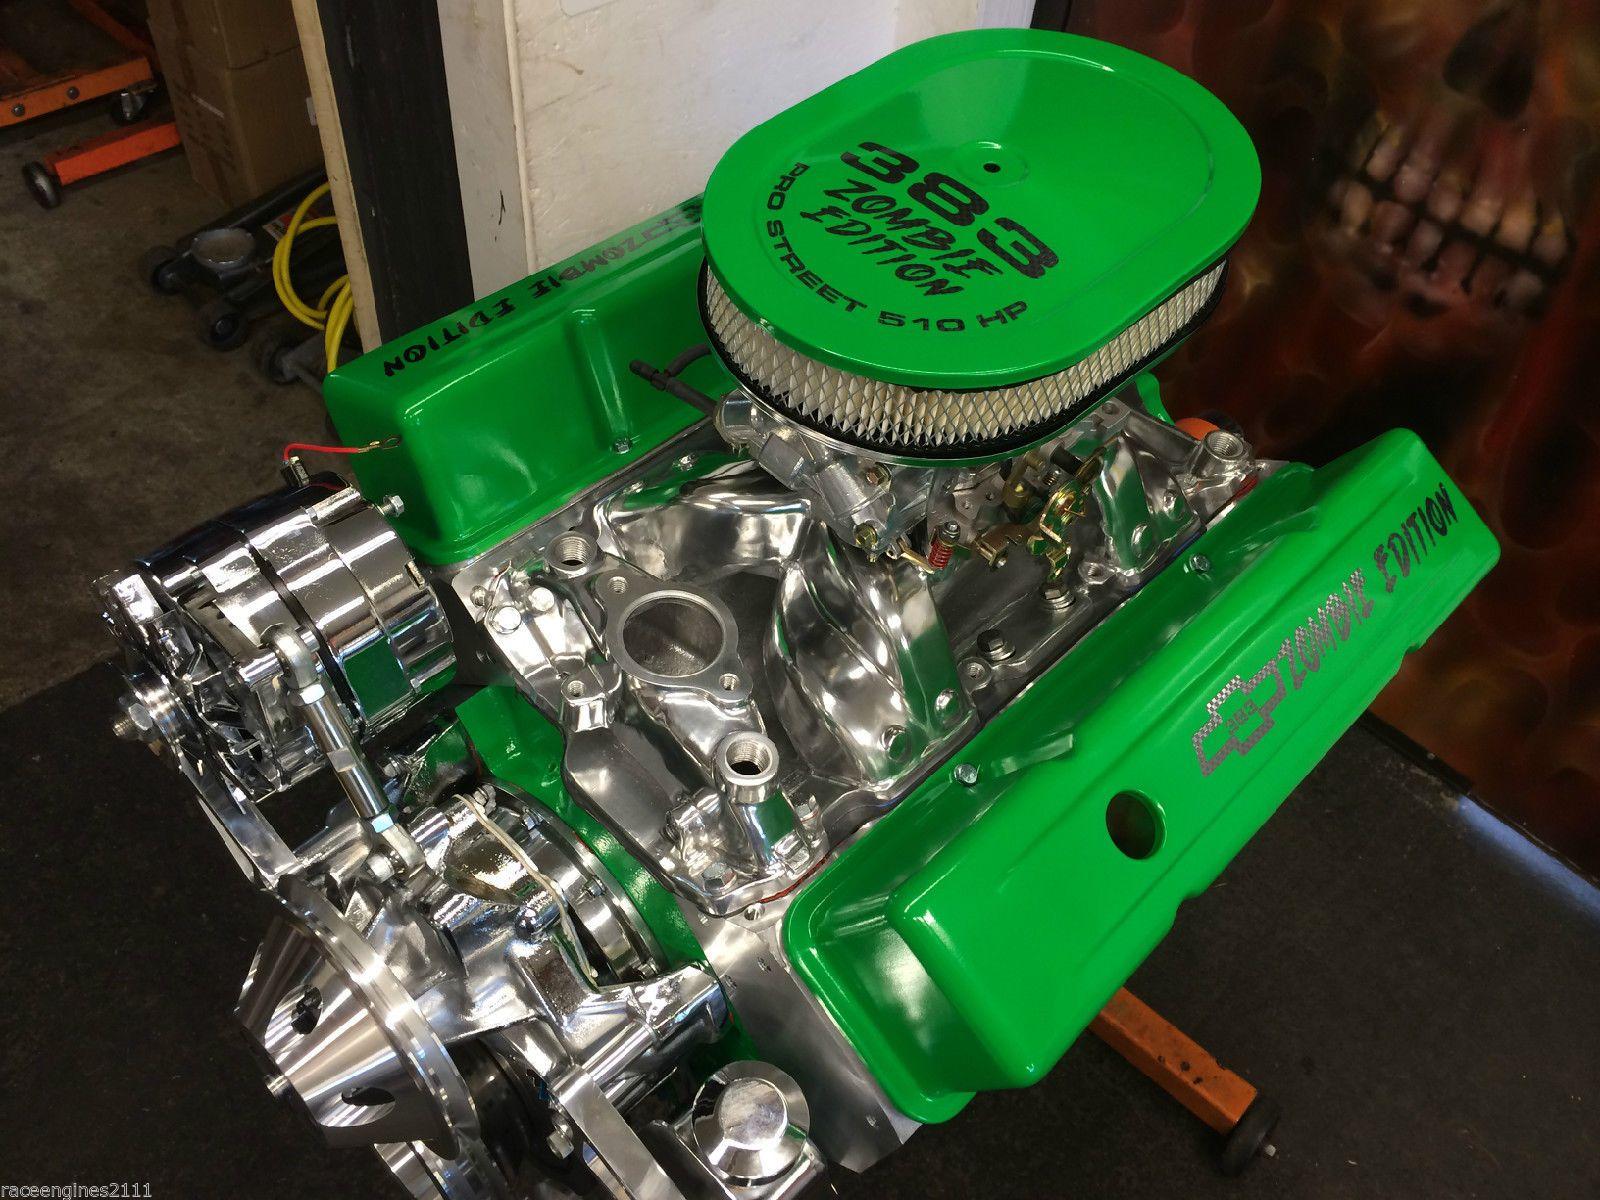 383 stroker motor theme 510hp roller turnkey option pro st for Ebay motors parts for sale